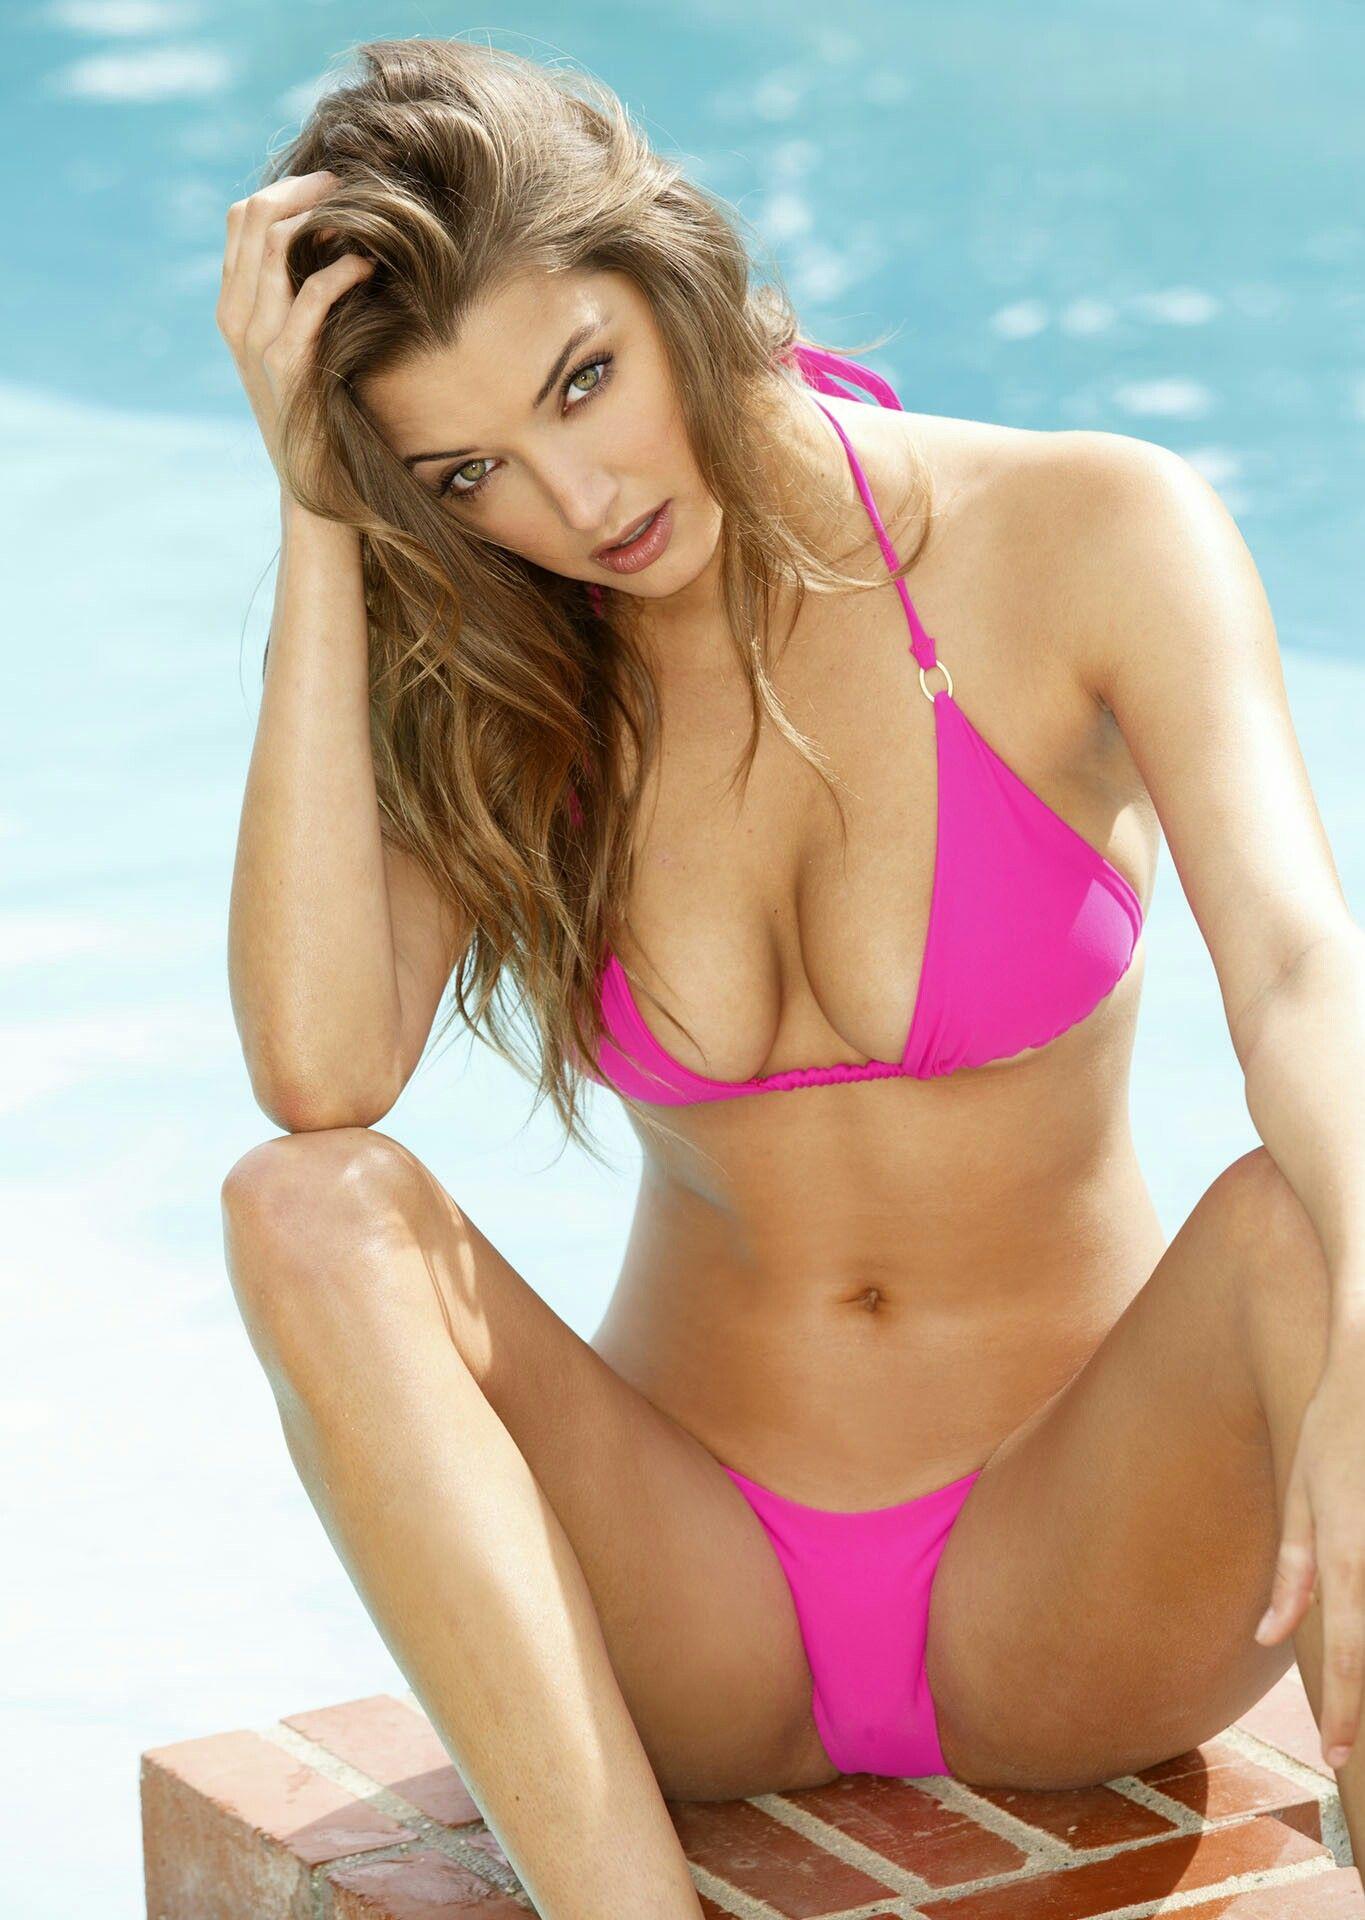 Alyssa Arce Movies alyssa arce | bikinis, bikini fashion, pink bikini